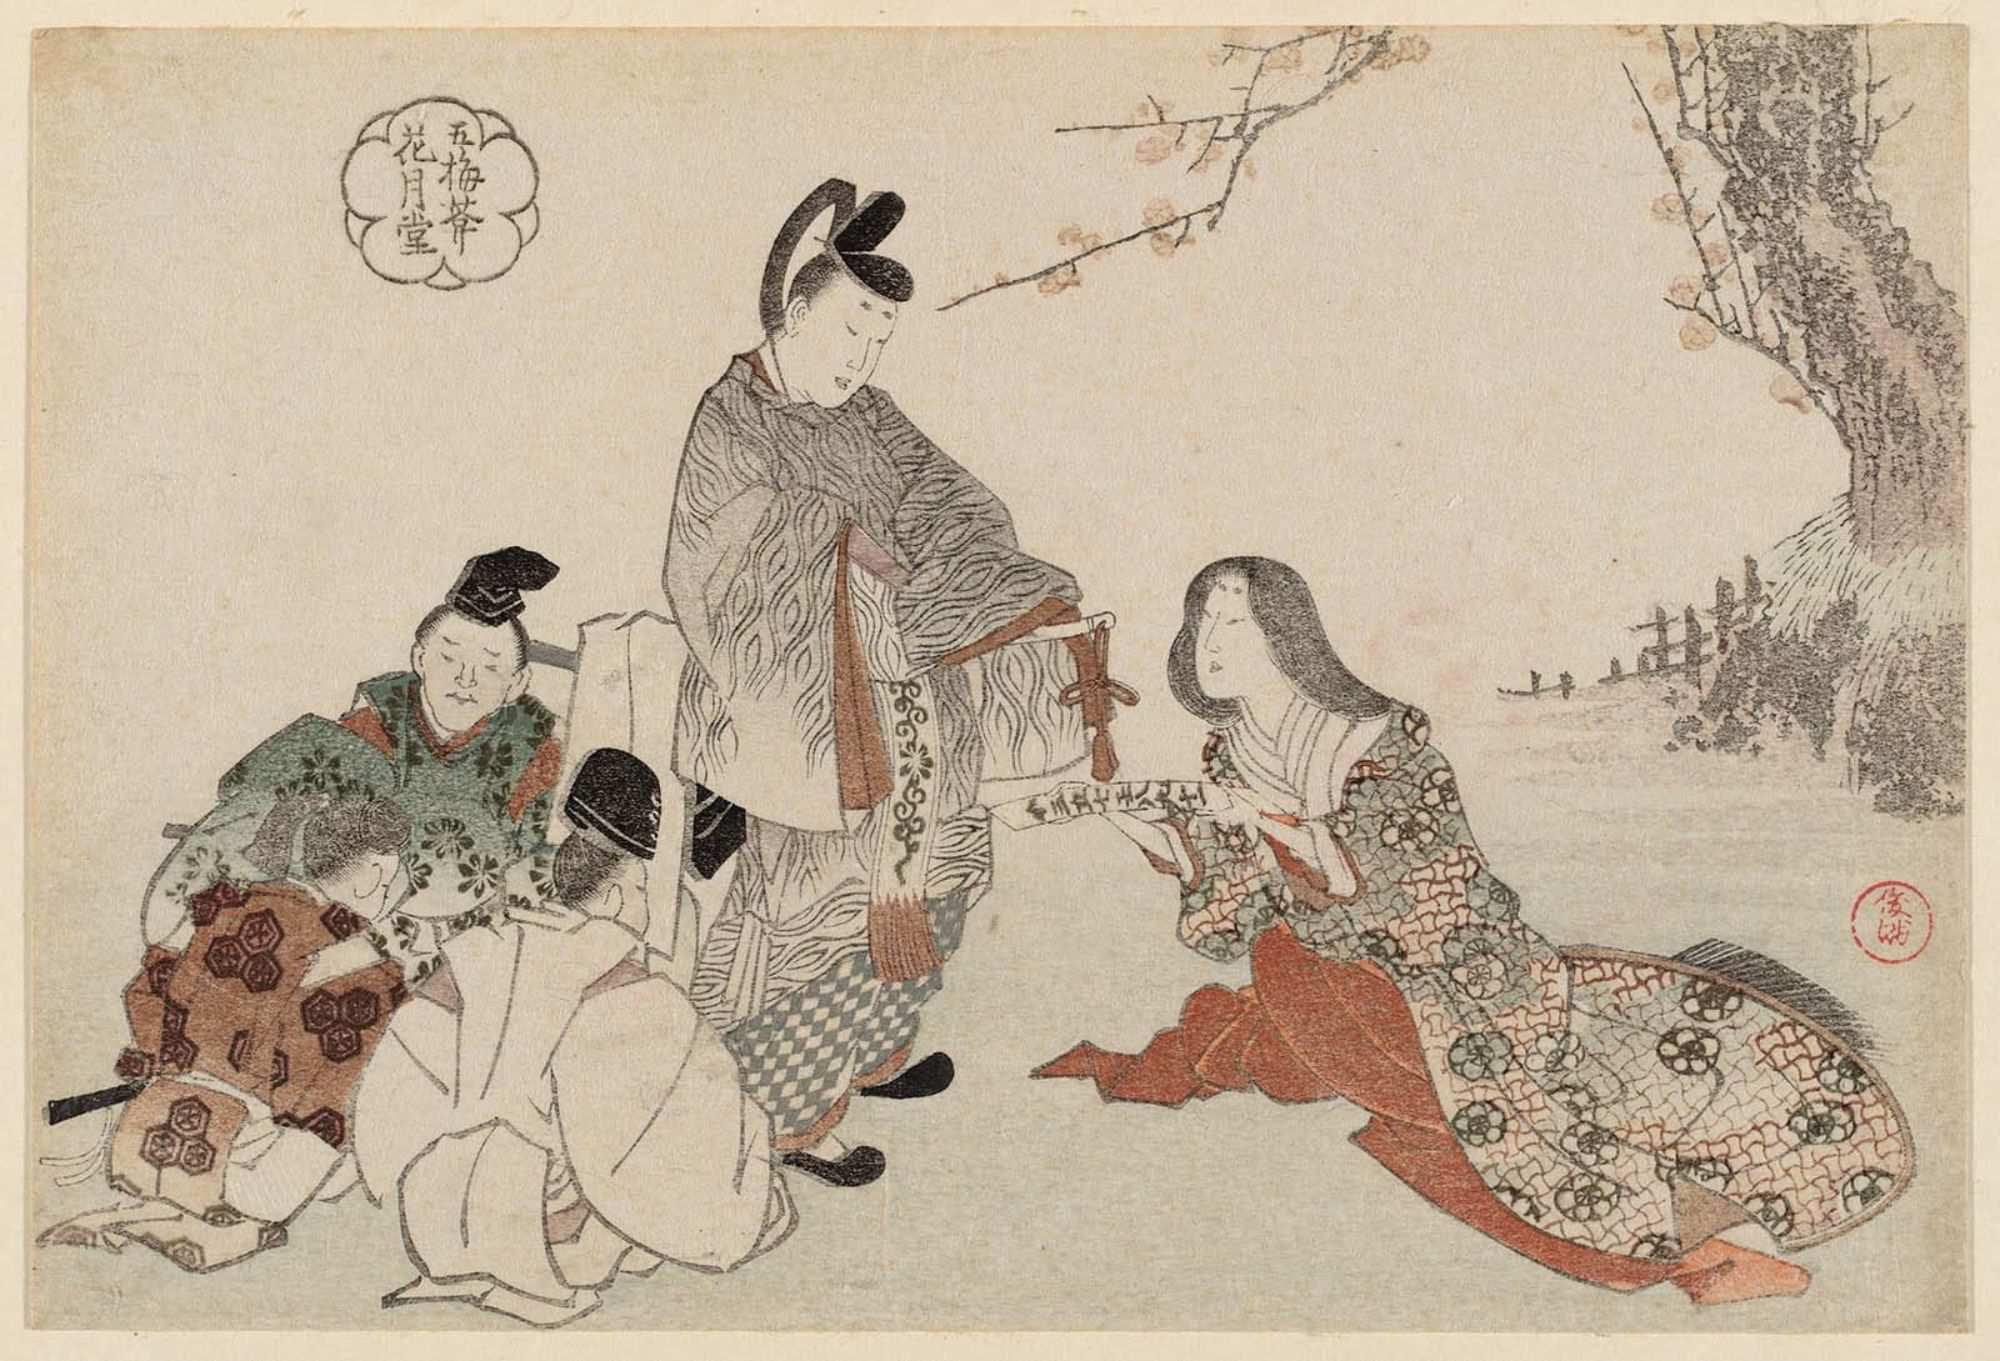 The Daughter of Ki no Tsurayuki and the Imperial Messenger_1816_140х206 мм